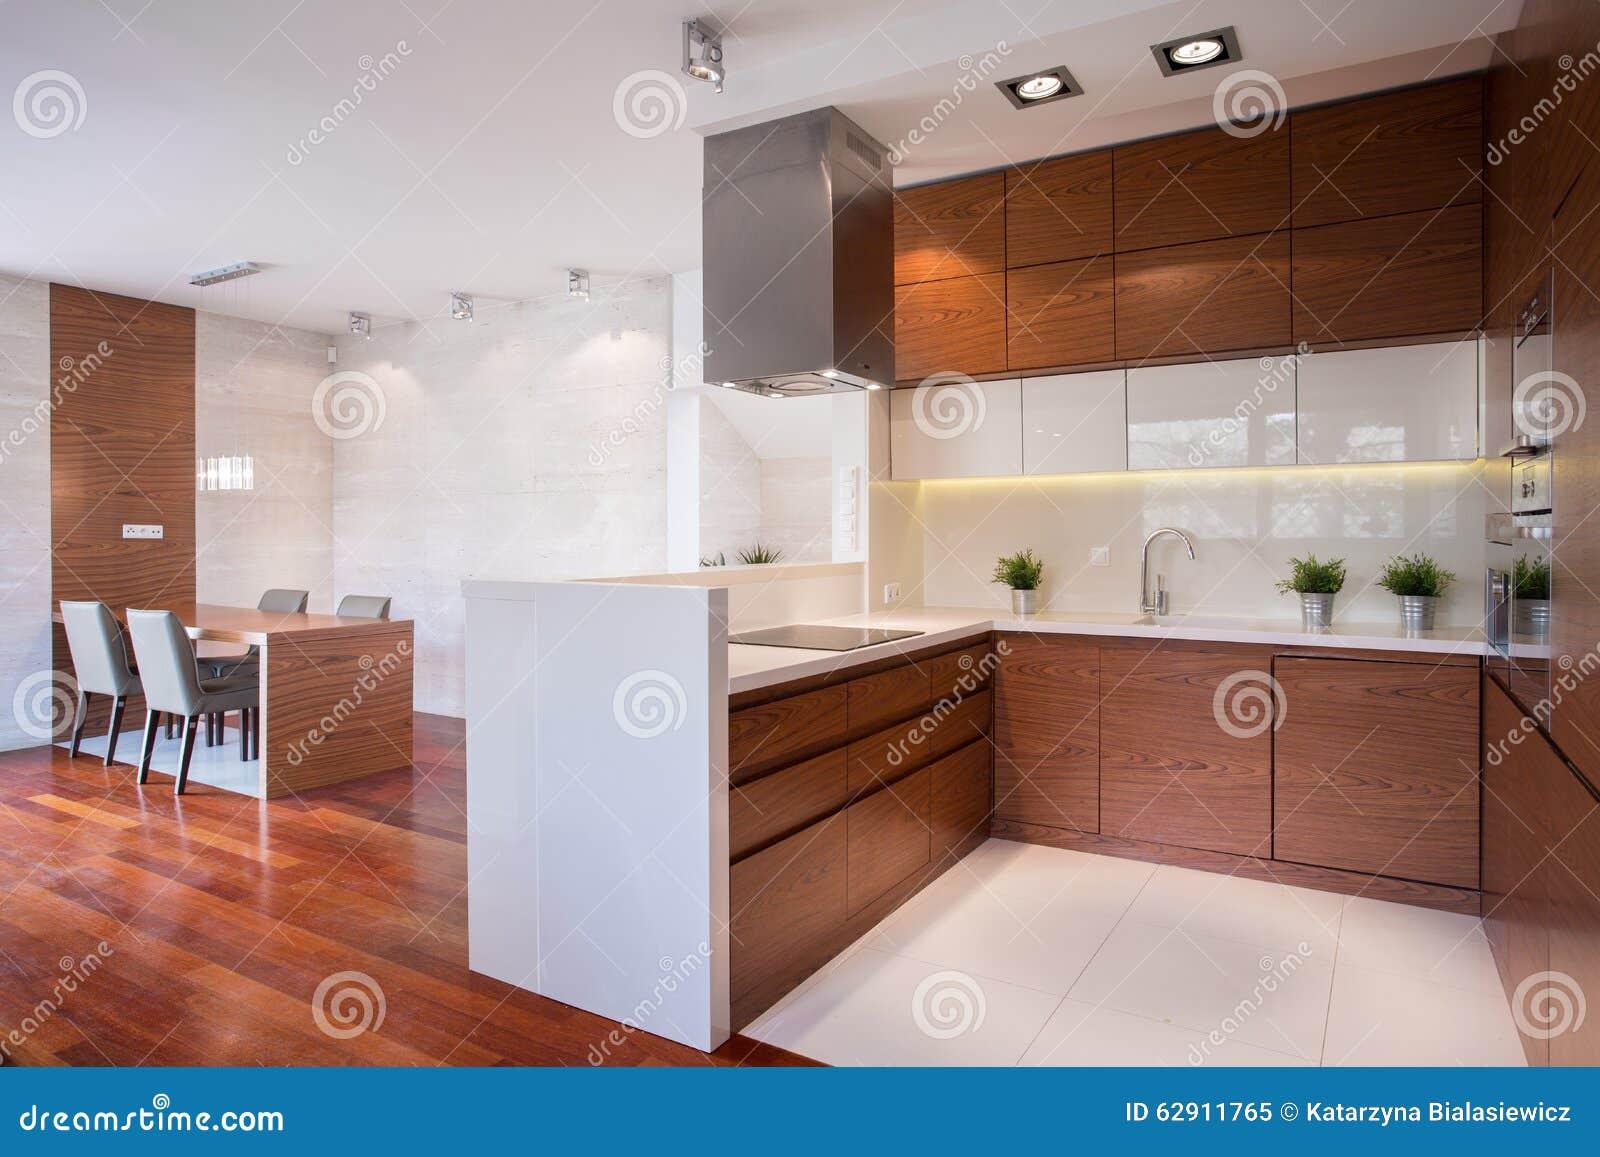 Cucina moderna in legno fotografia stock immagine 62911765 - Cucina moderna in legno ...